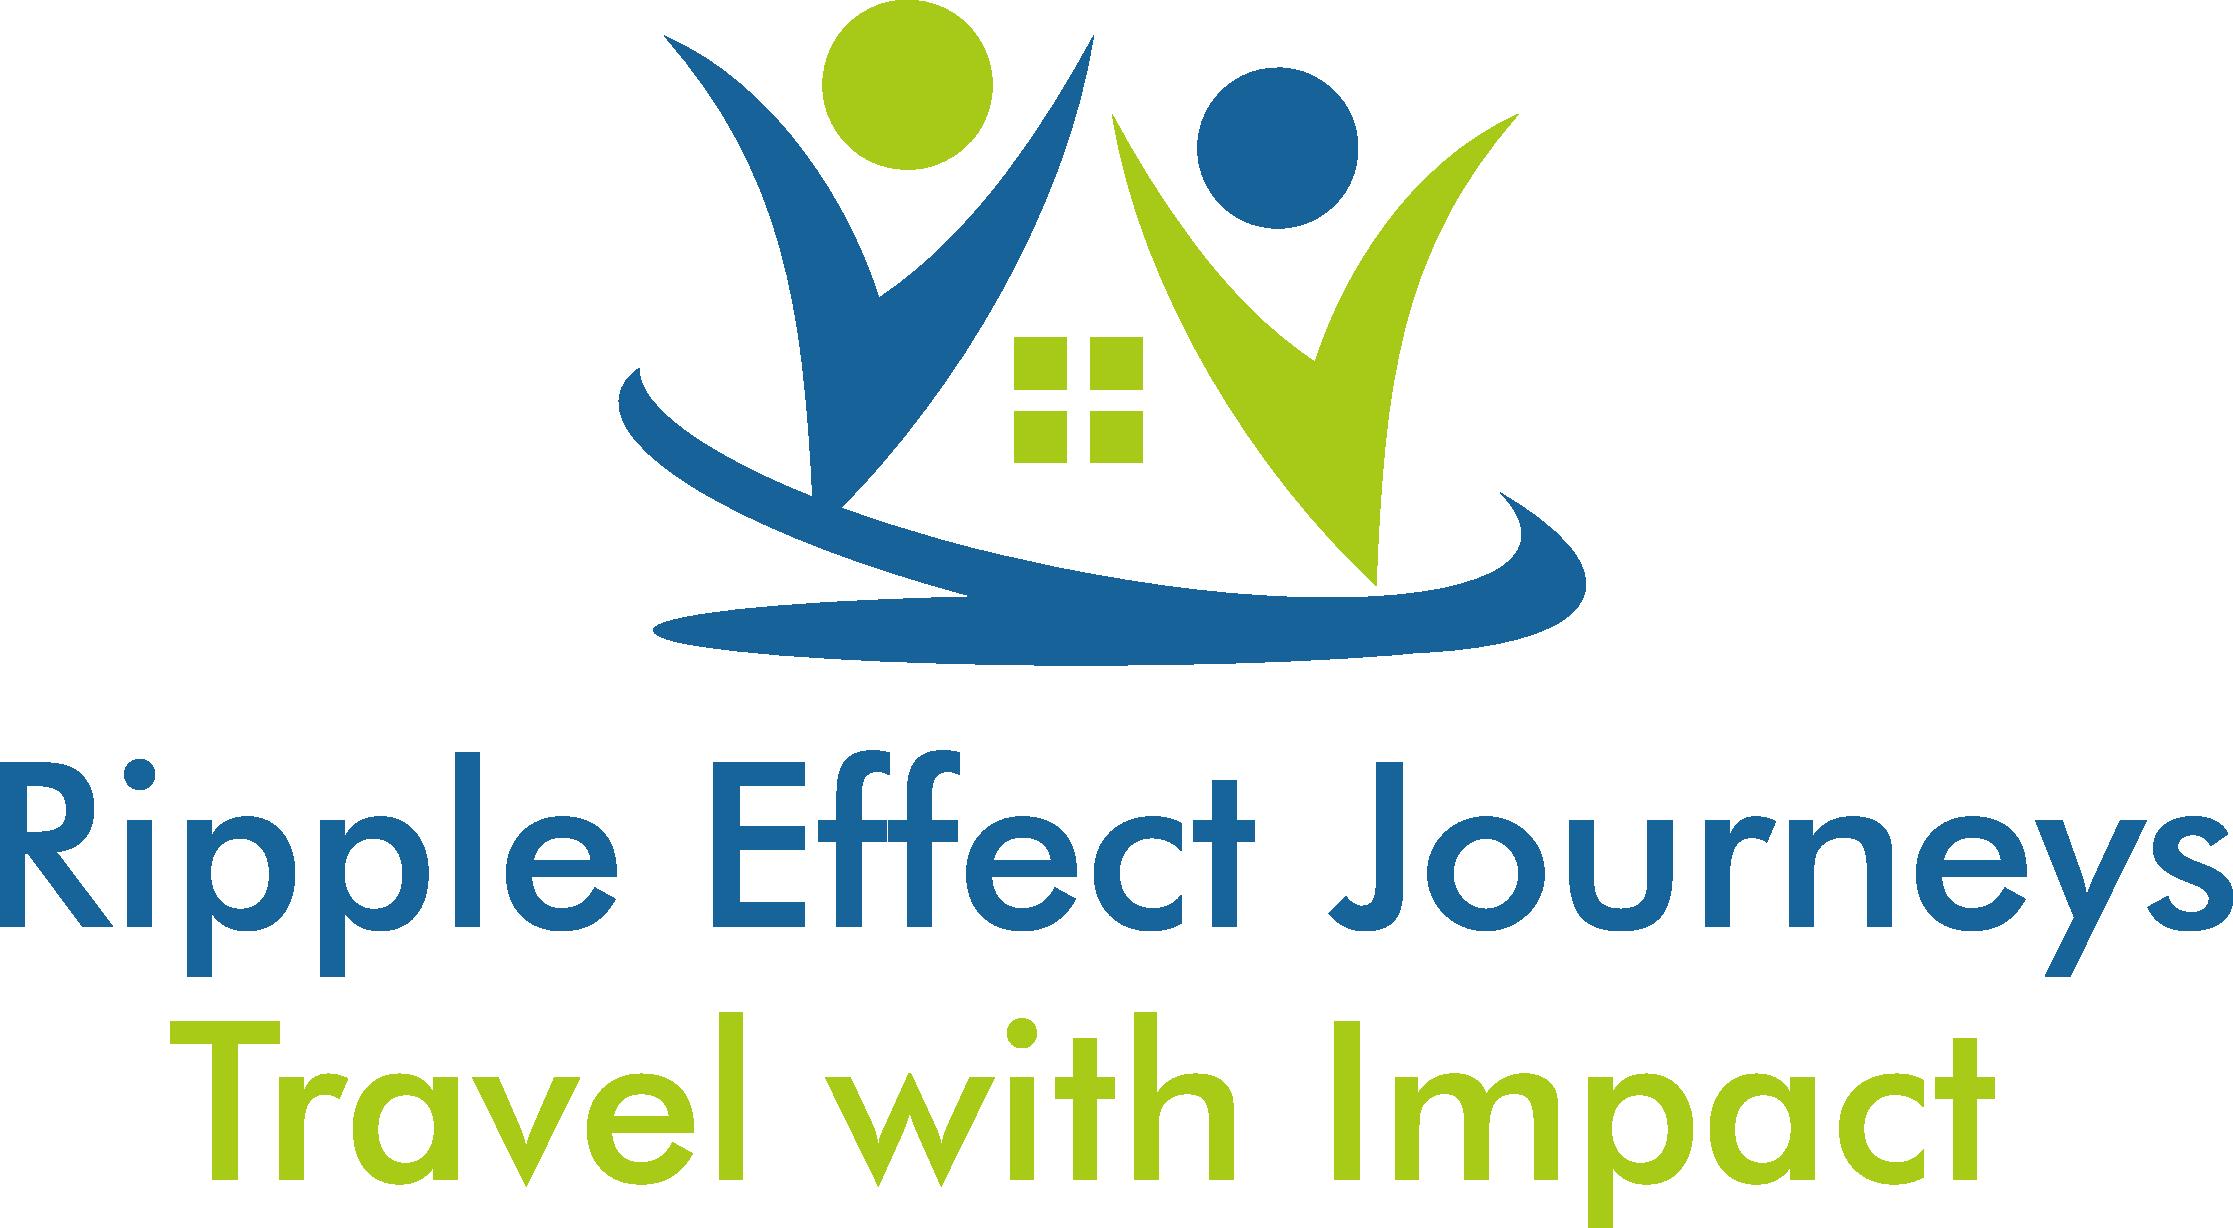 Ripple Effect Journeys